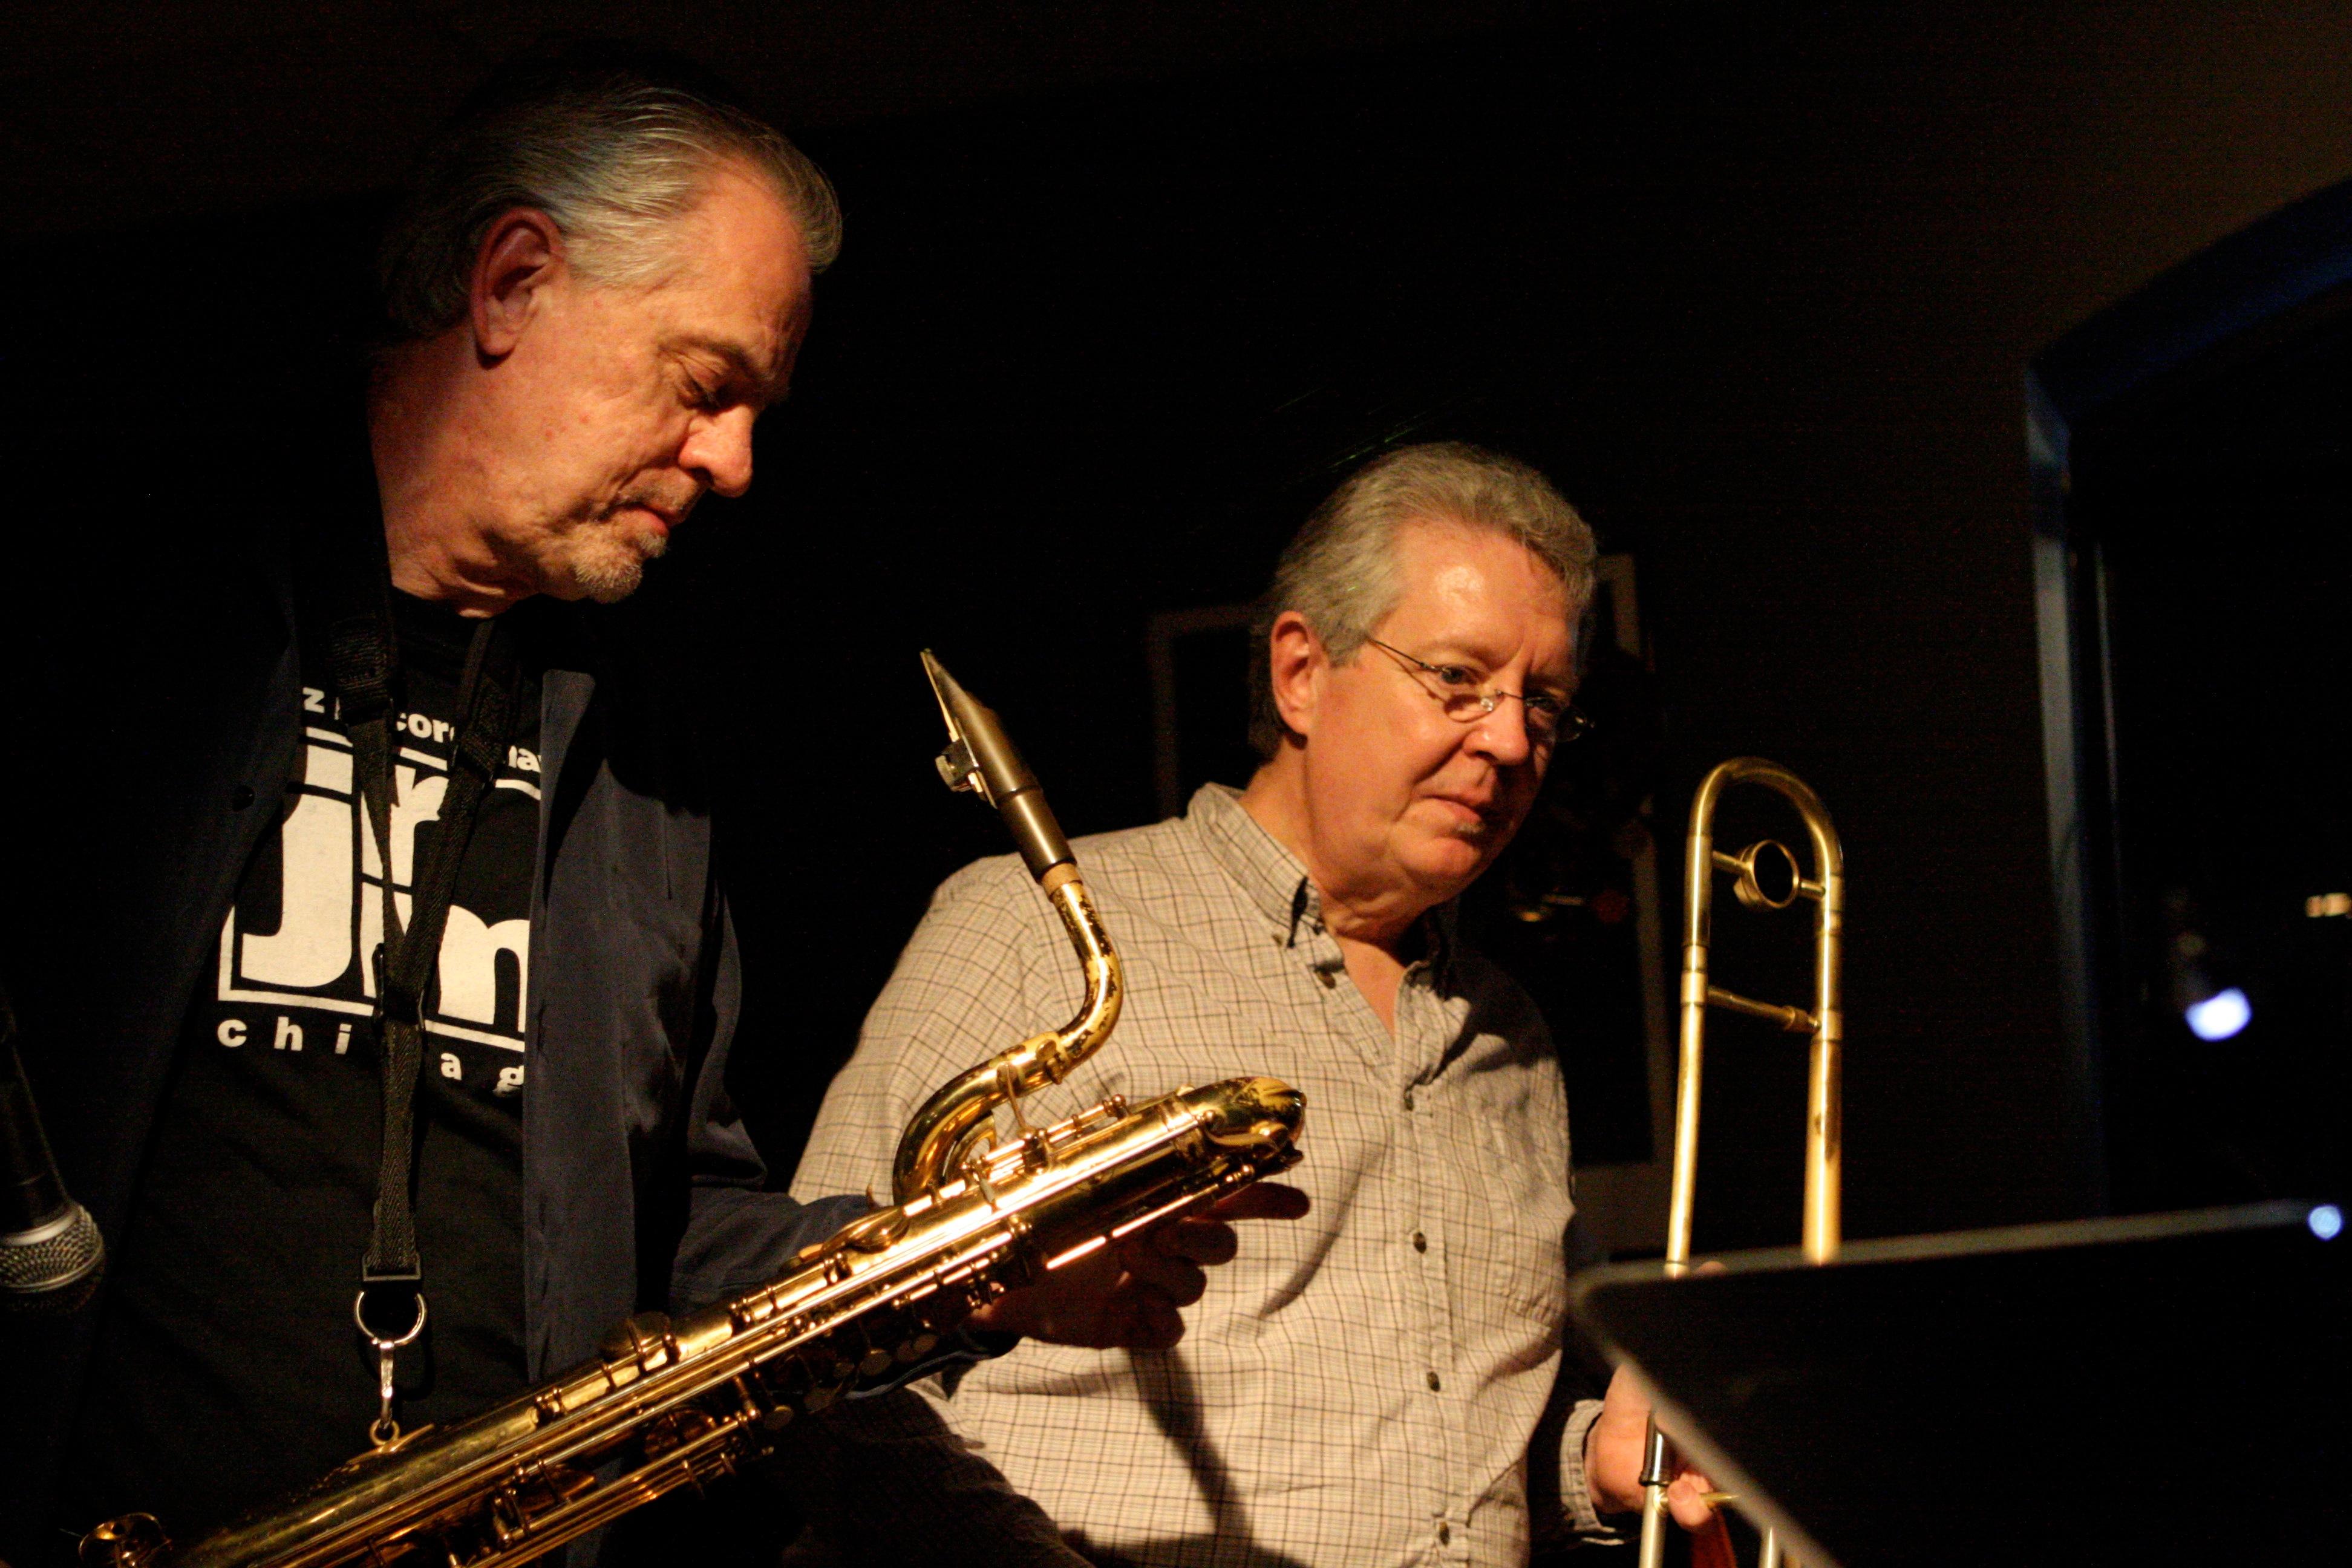 Glenn and Jim Pugh - Trombari